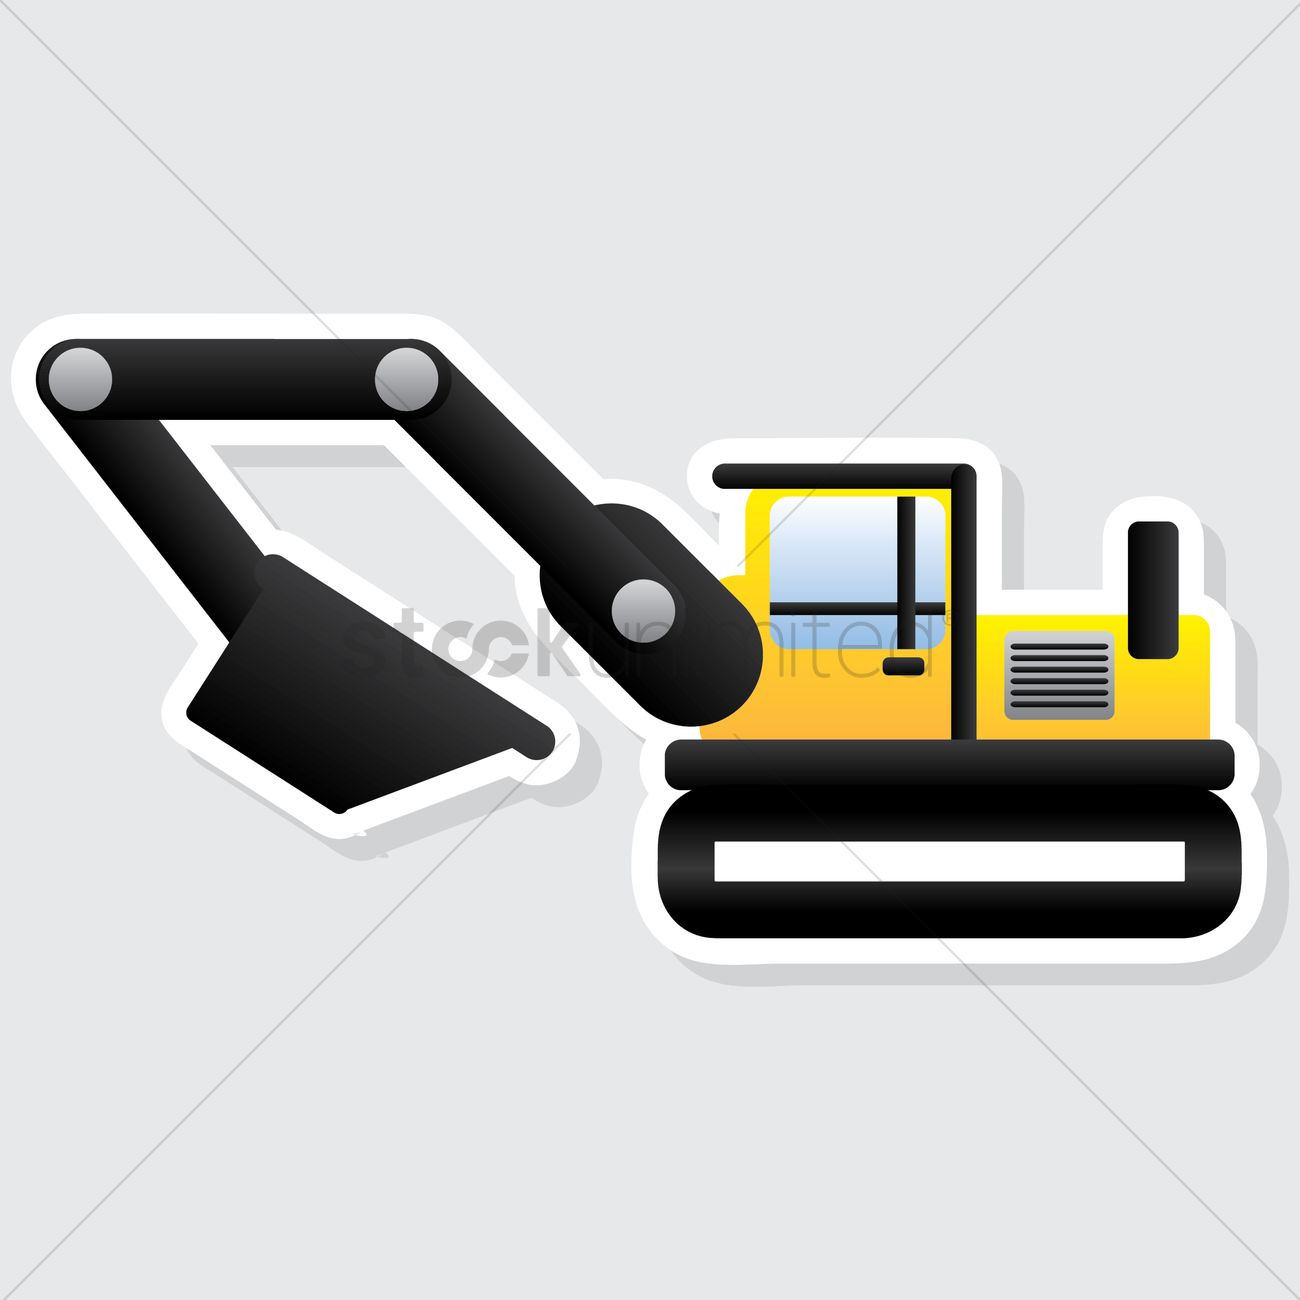 Mini excavator Vector Image - 1617686 | StockUnlimited